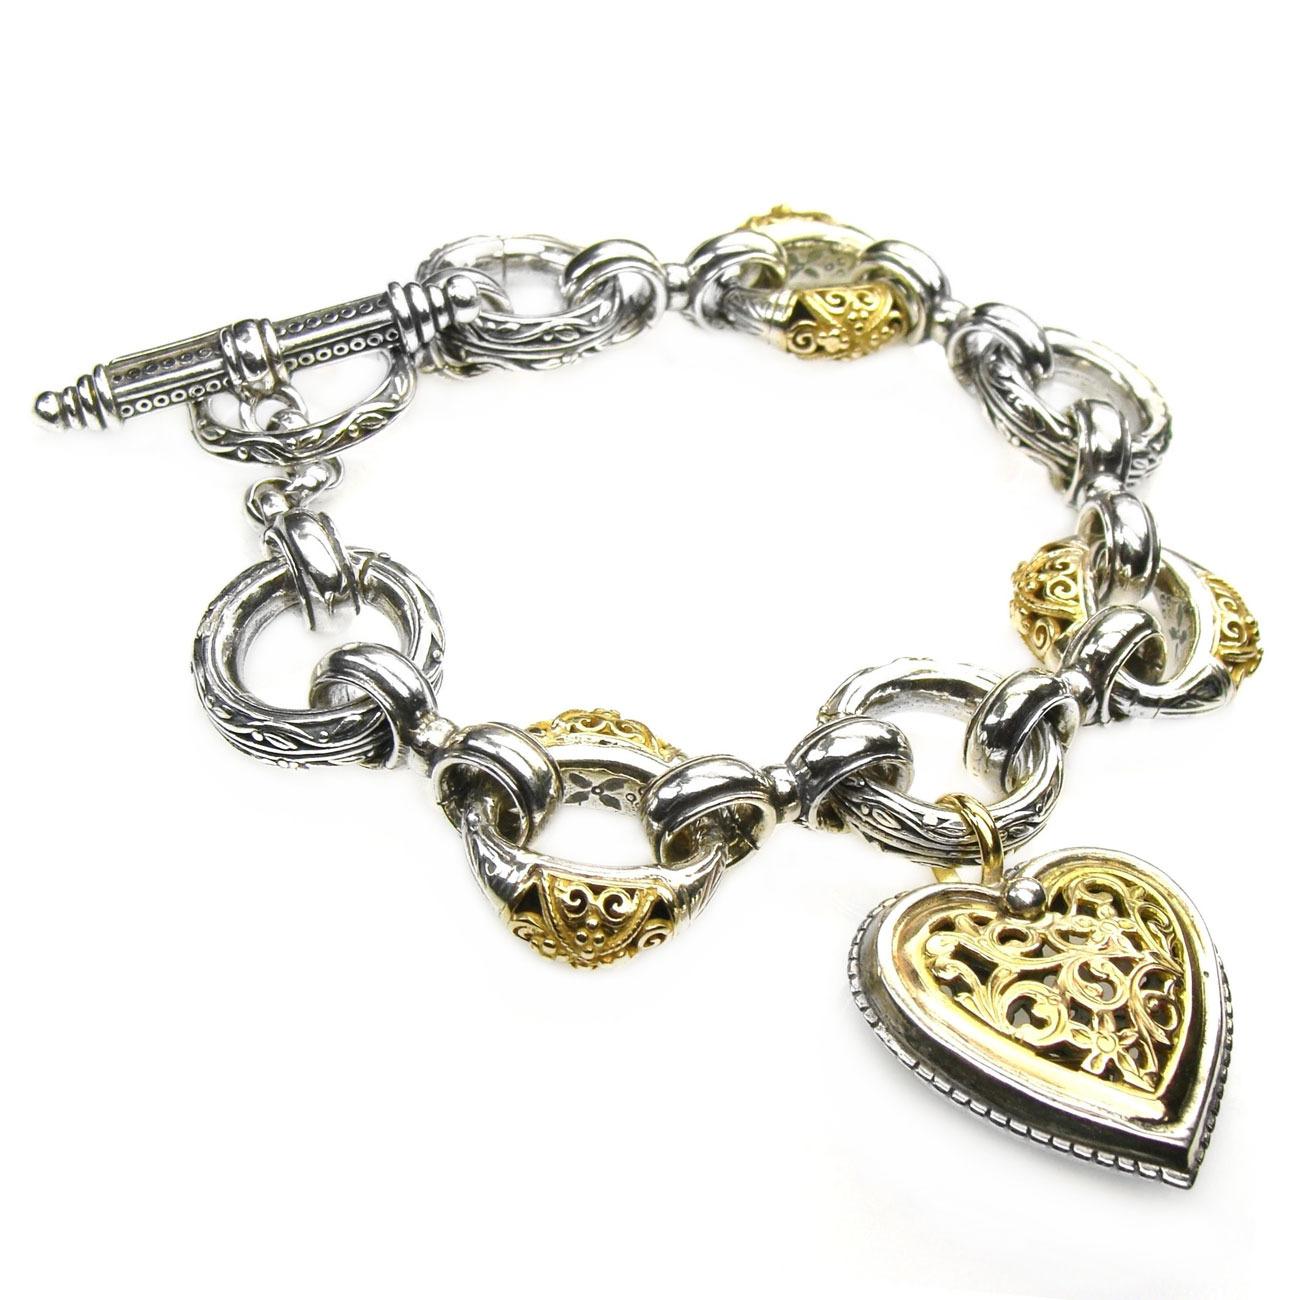 02006275 gerochristo 6275 gold silver filigree heart charm bracelet 1